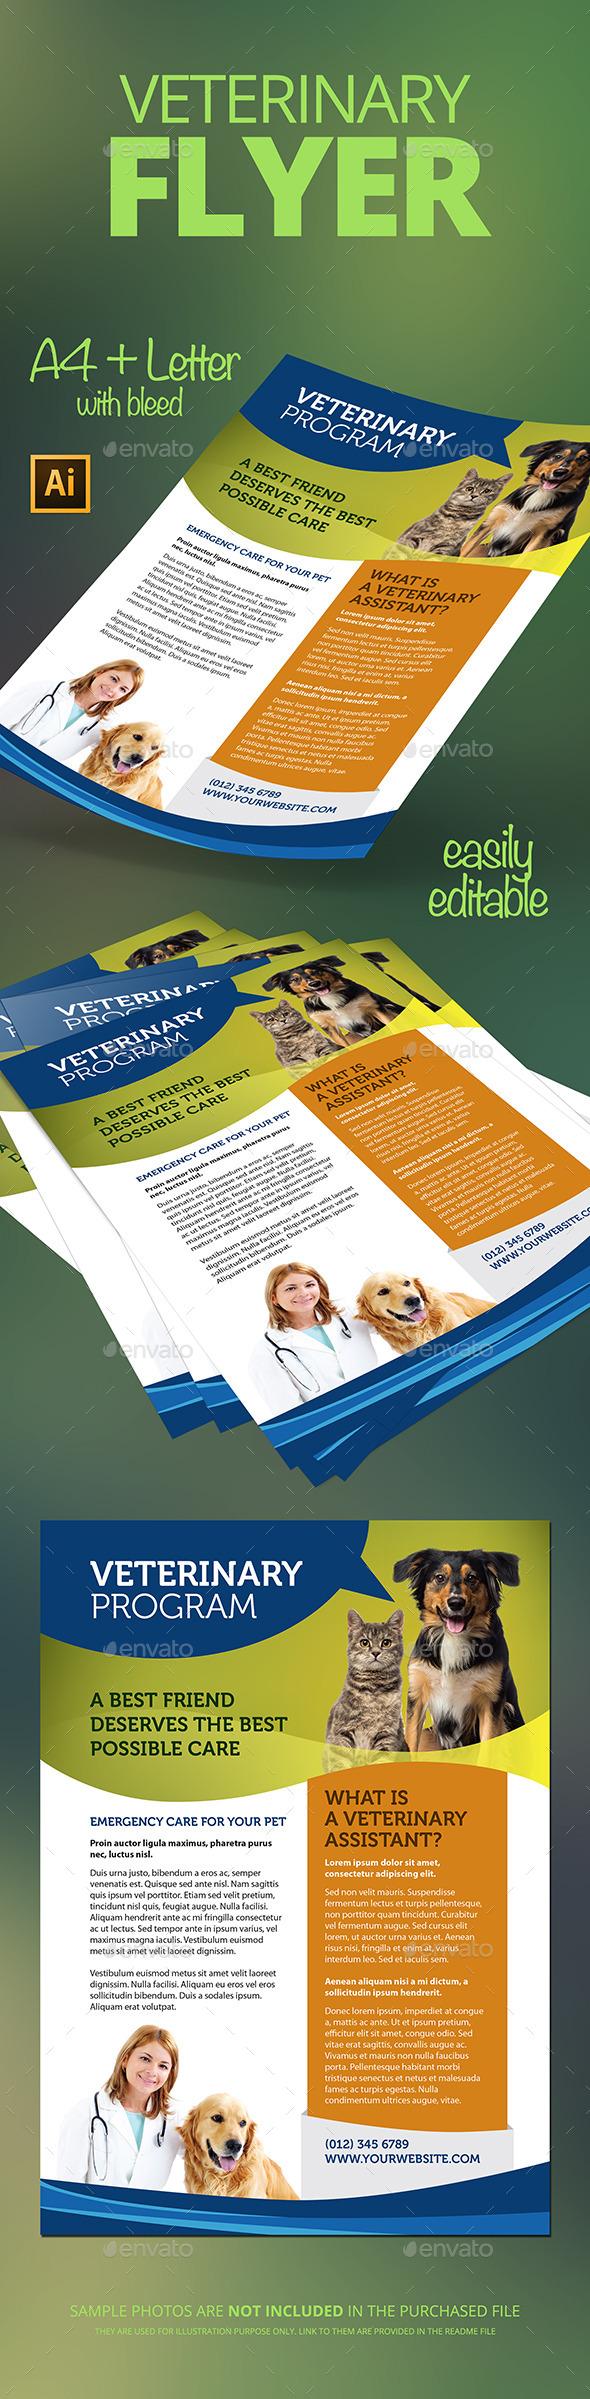 GraphicRiver Veterinary Flyer 11846662